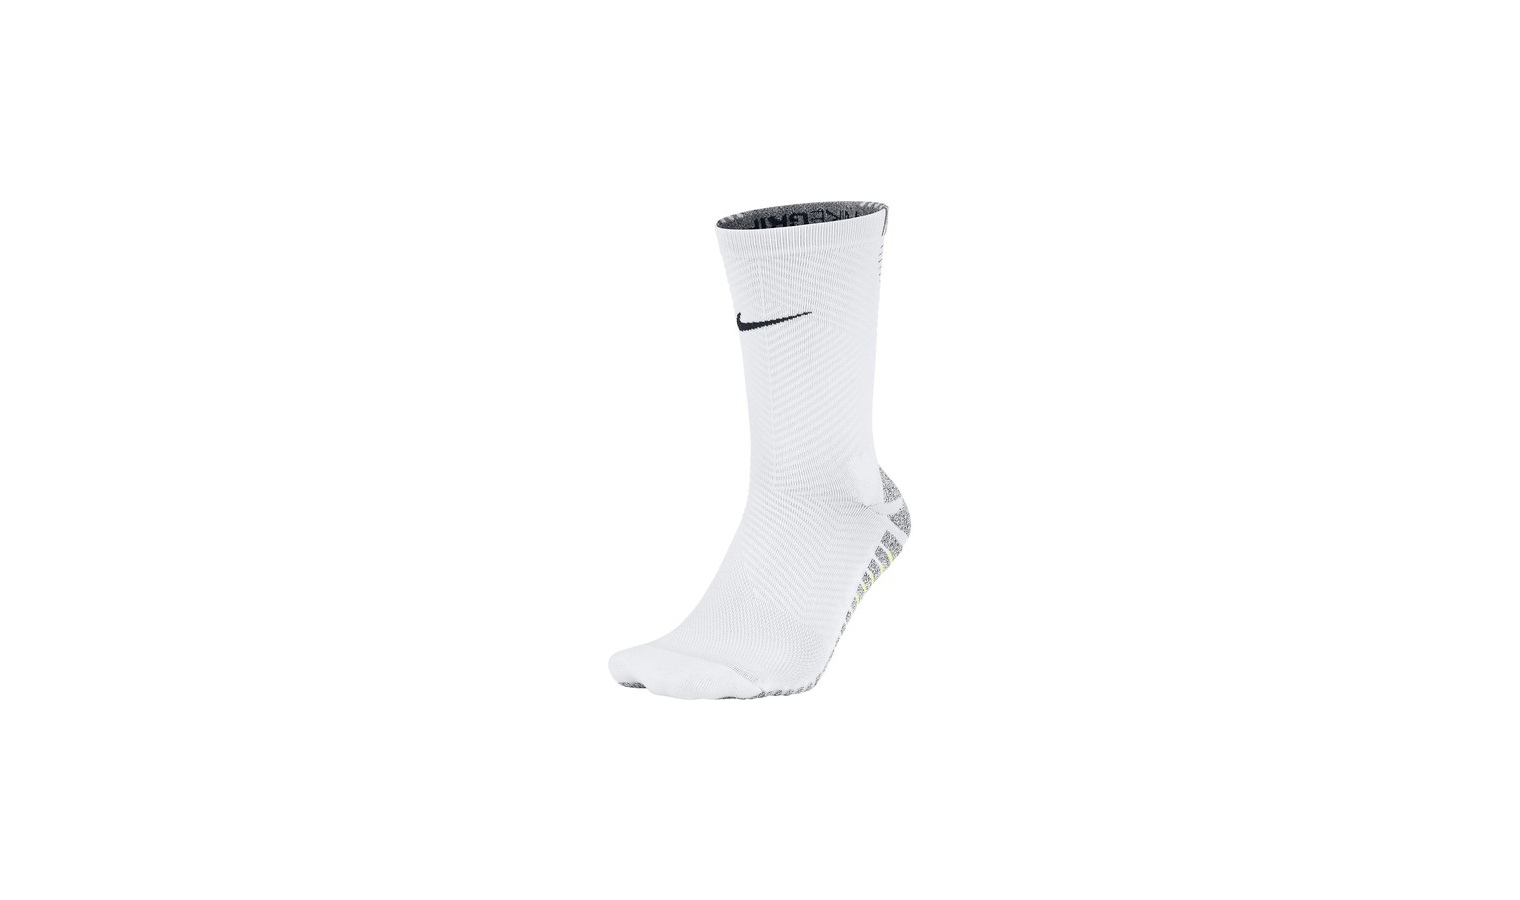 3b0d4958e8c44 Ponožky Nike GRIP STRIKE LIGHT CREW bílé | AD Sport.cz